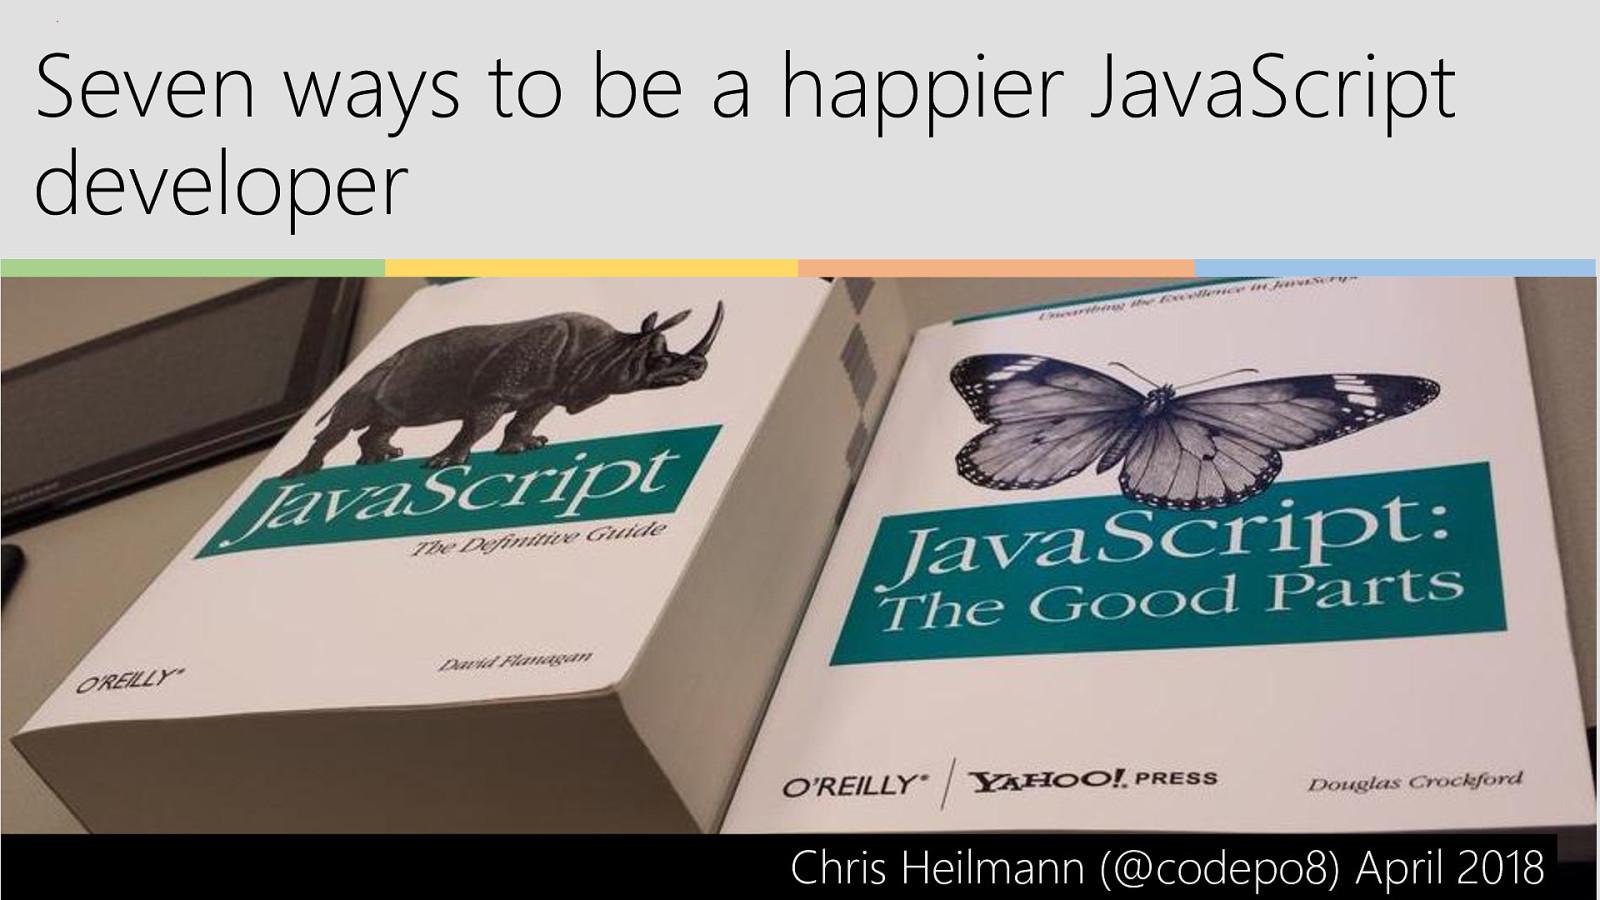 Seven ways to be a happier JavaScript developer